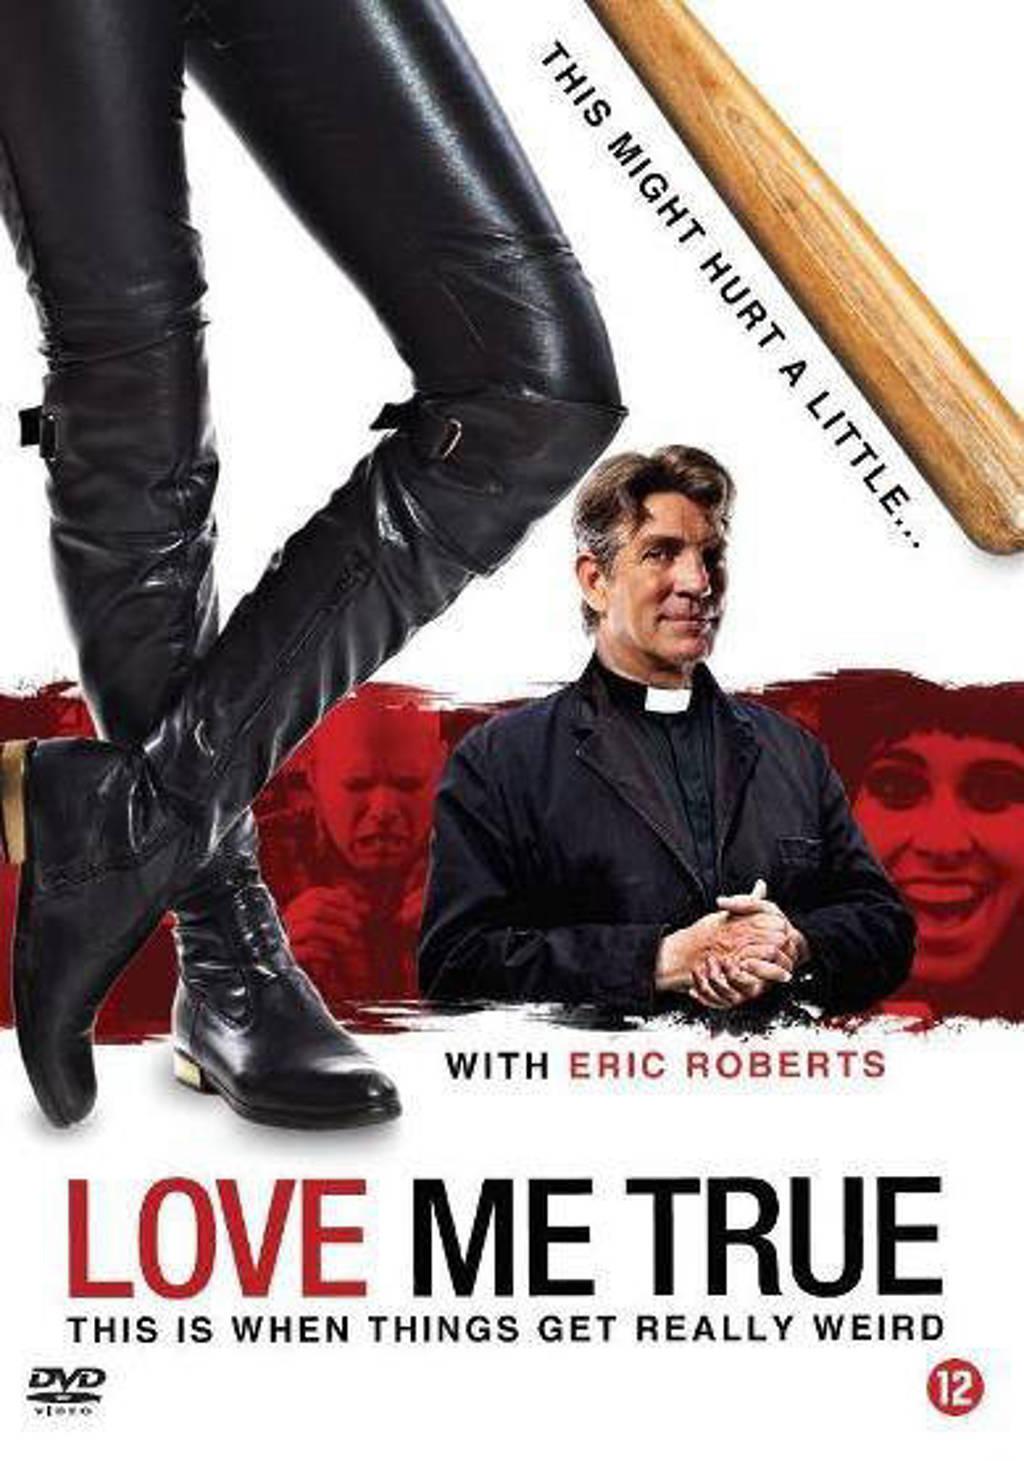 Love me true (DVD)